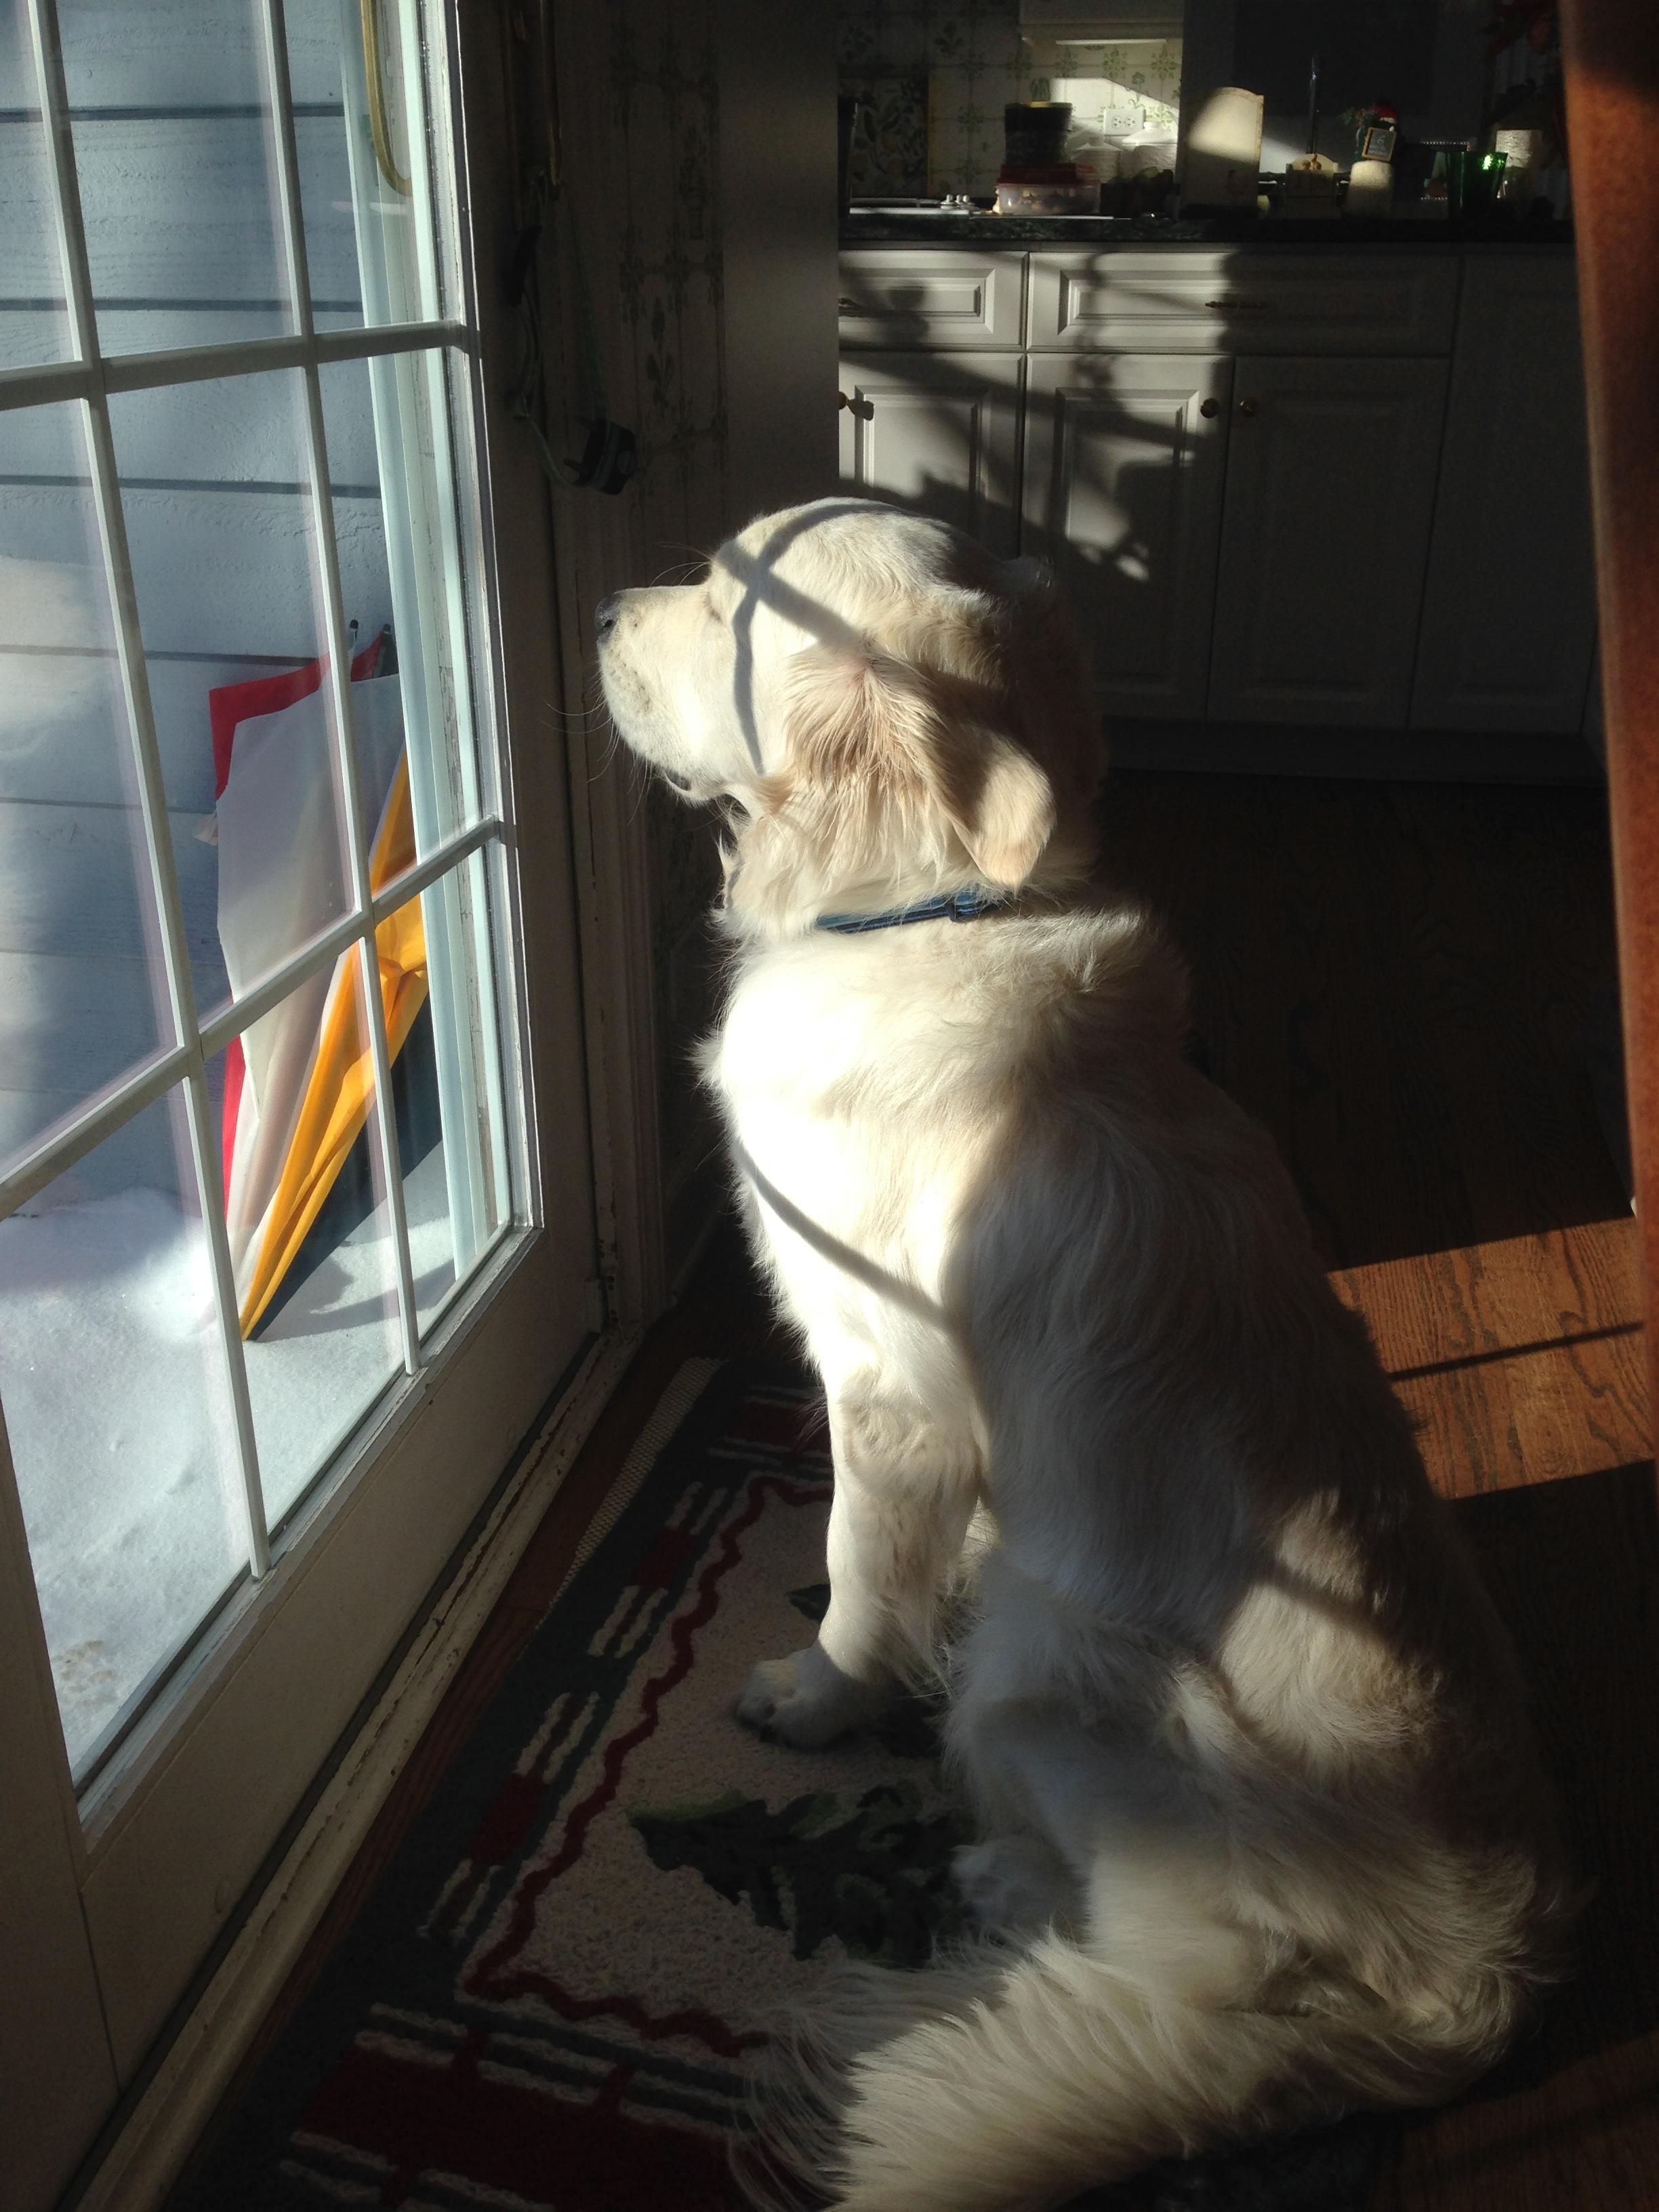 Murphy's Reflection